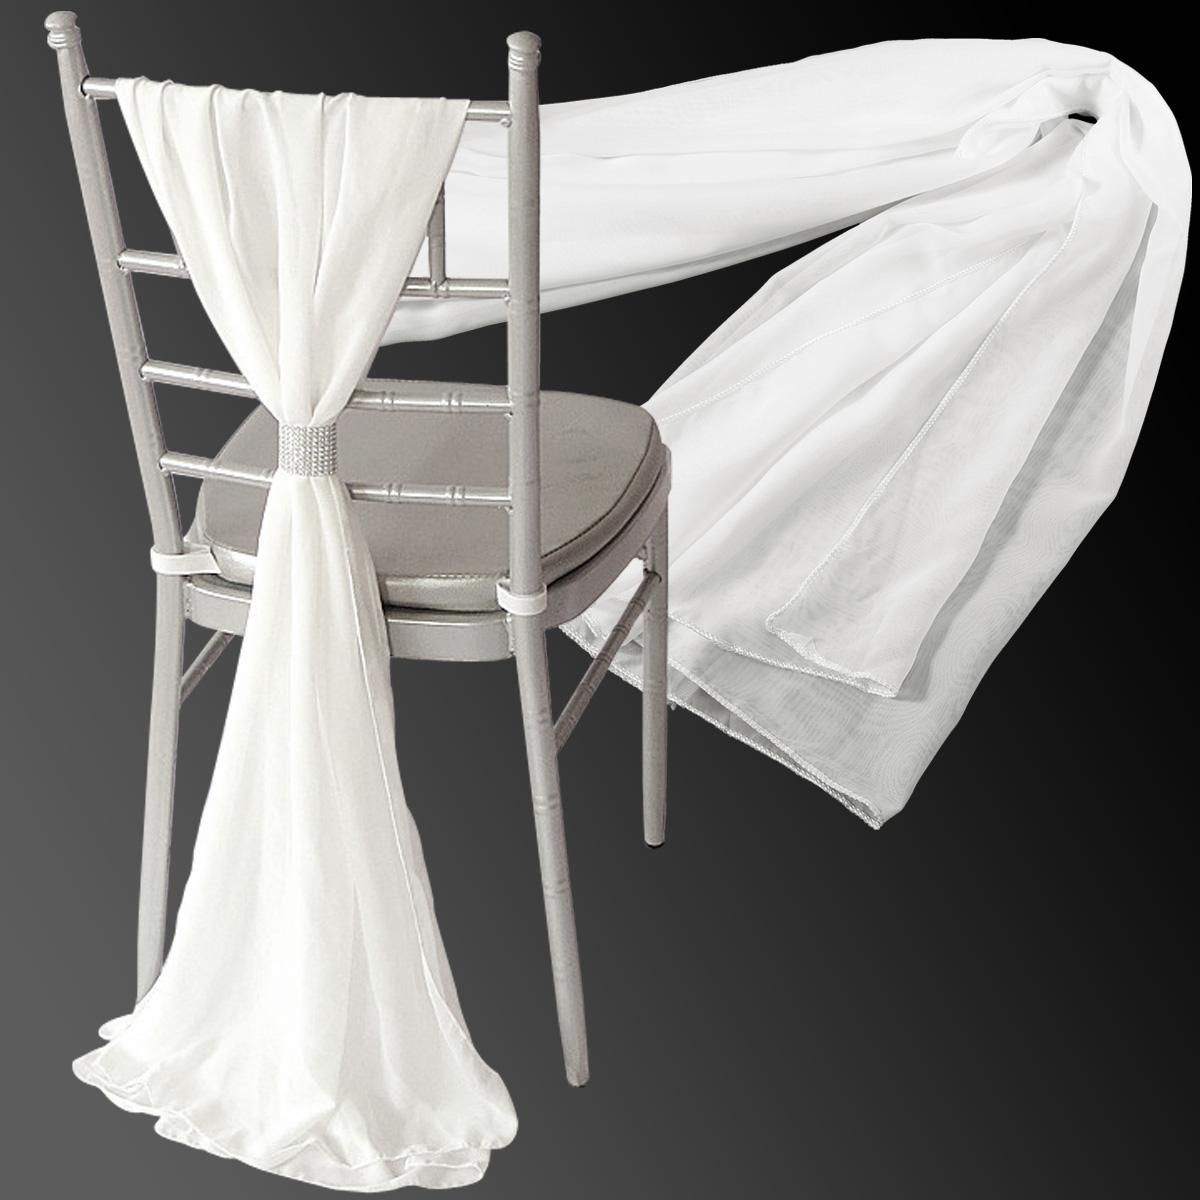 Bulk Of 10pcs Chiffon Vertical Drops Chair Cover Tie Bow